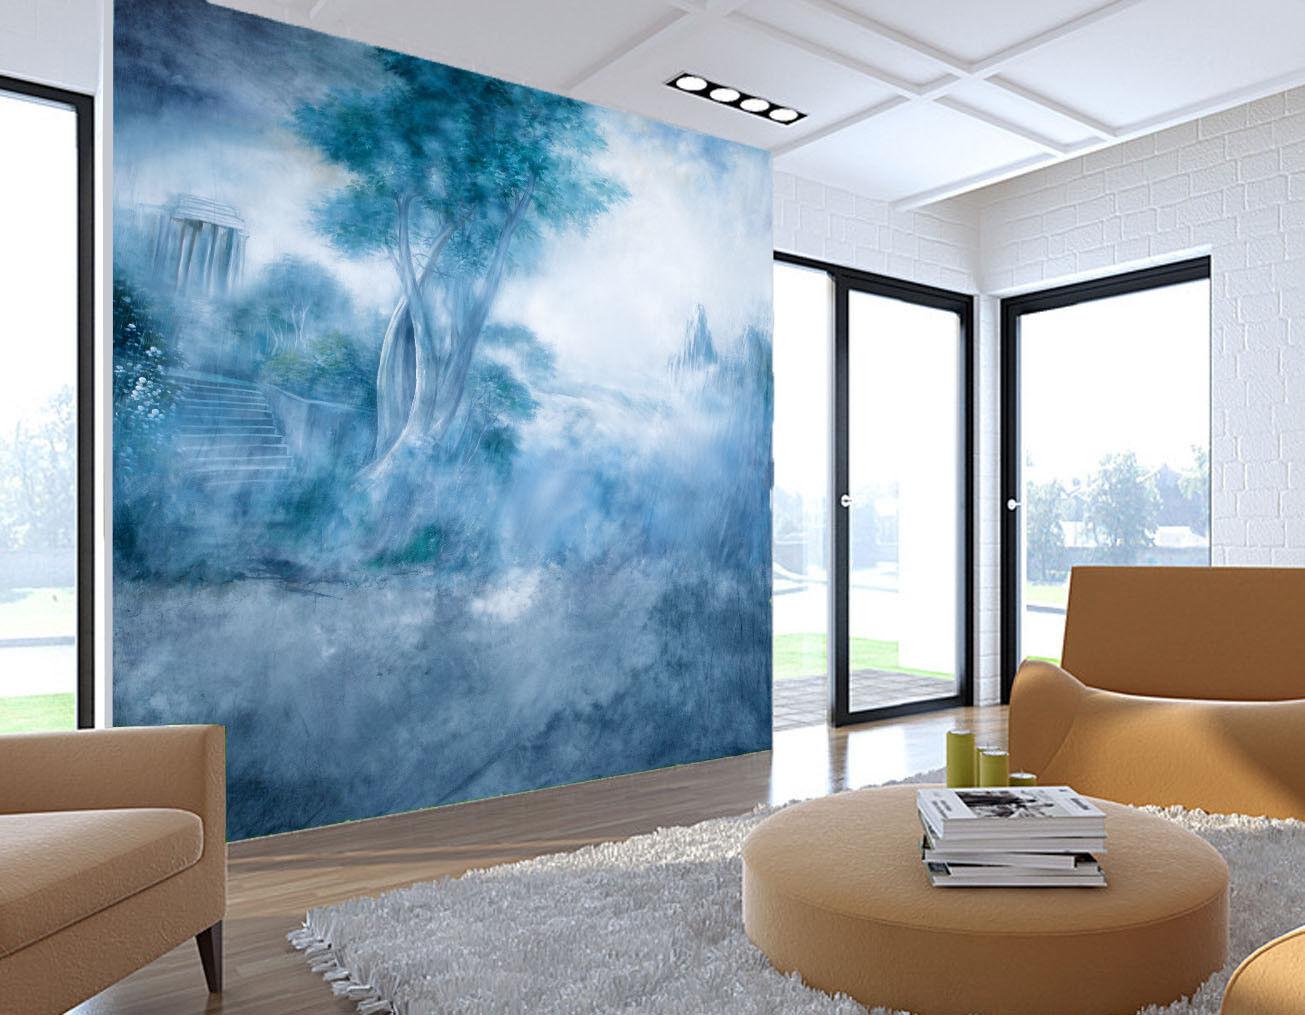 3D Neblig Landstraße 85 Tapete Wandgemälde Tapete Tapeten Bild Familie DE Summer  | Stilvoll und lustig  | Verrückte Preis  | Online Outlet Store